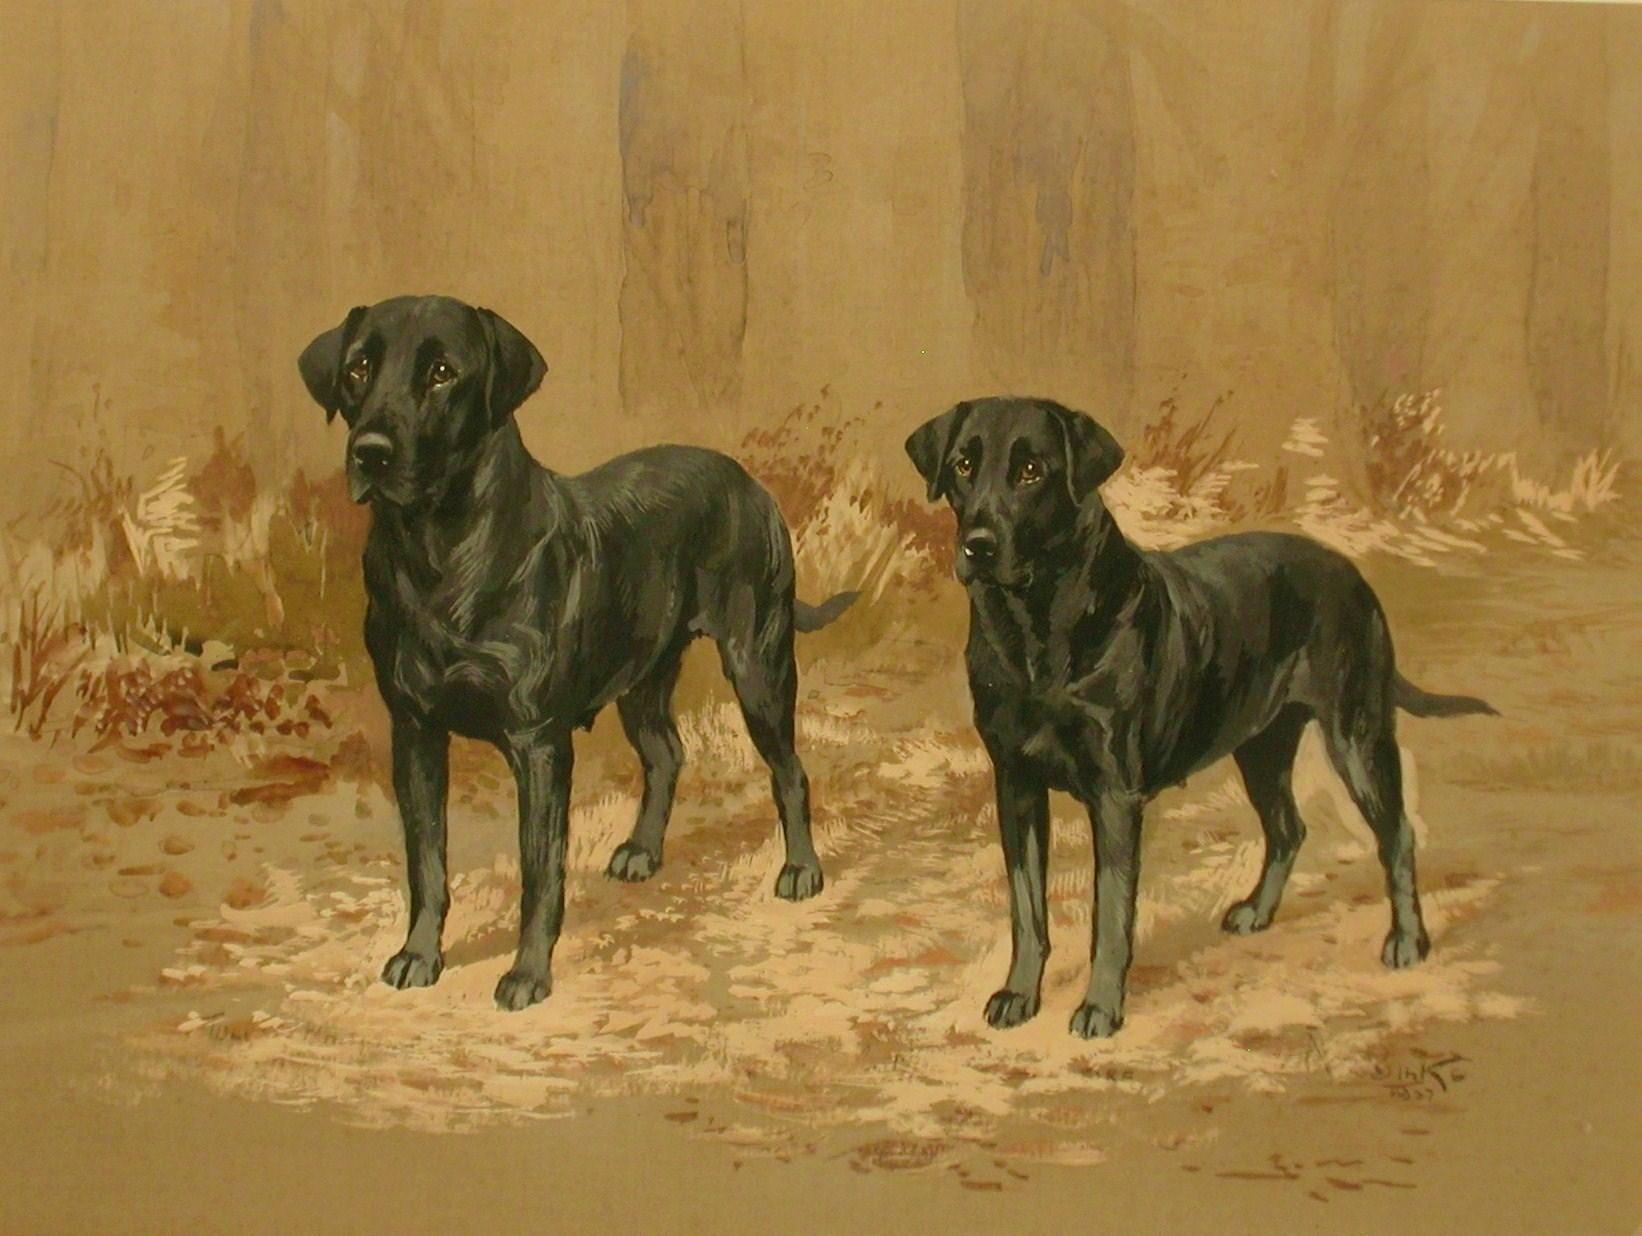 Click to see full size: Thomas W Twyford Whitmore Labrador Retriever by Reuben Ward Binks- Thomas W Twyford Whitmore Labrador Retriever by Reuben Ward Binks